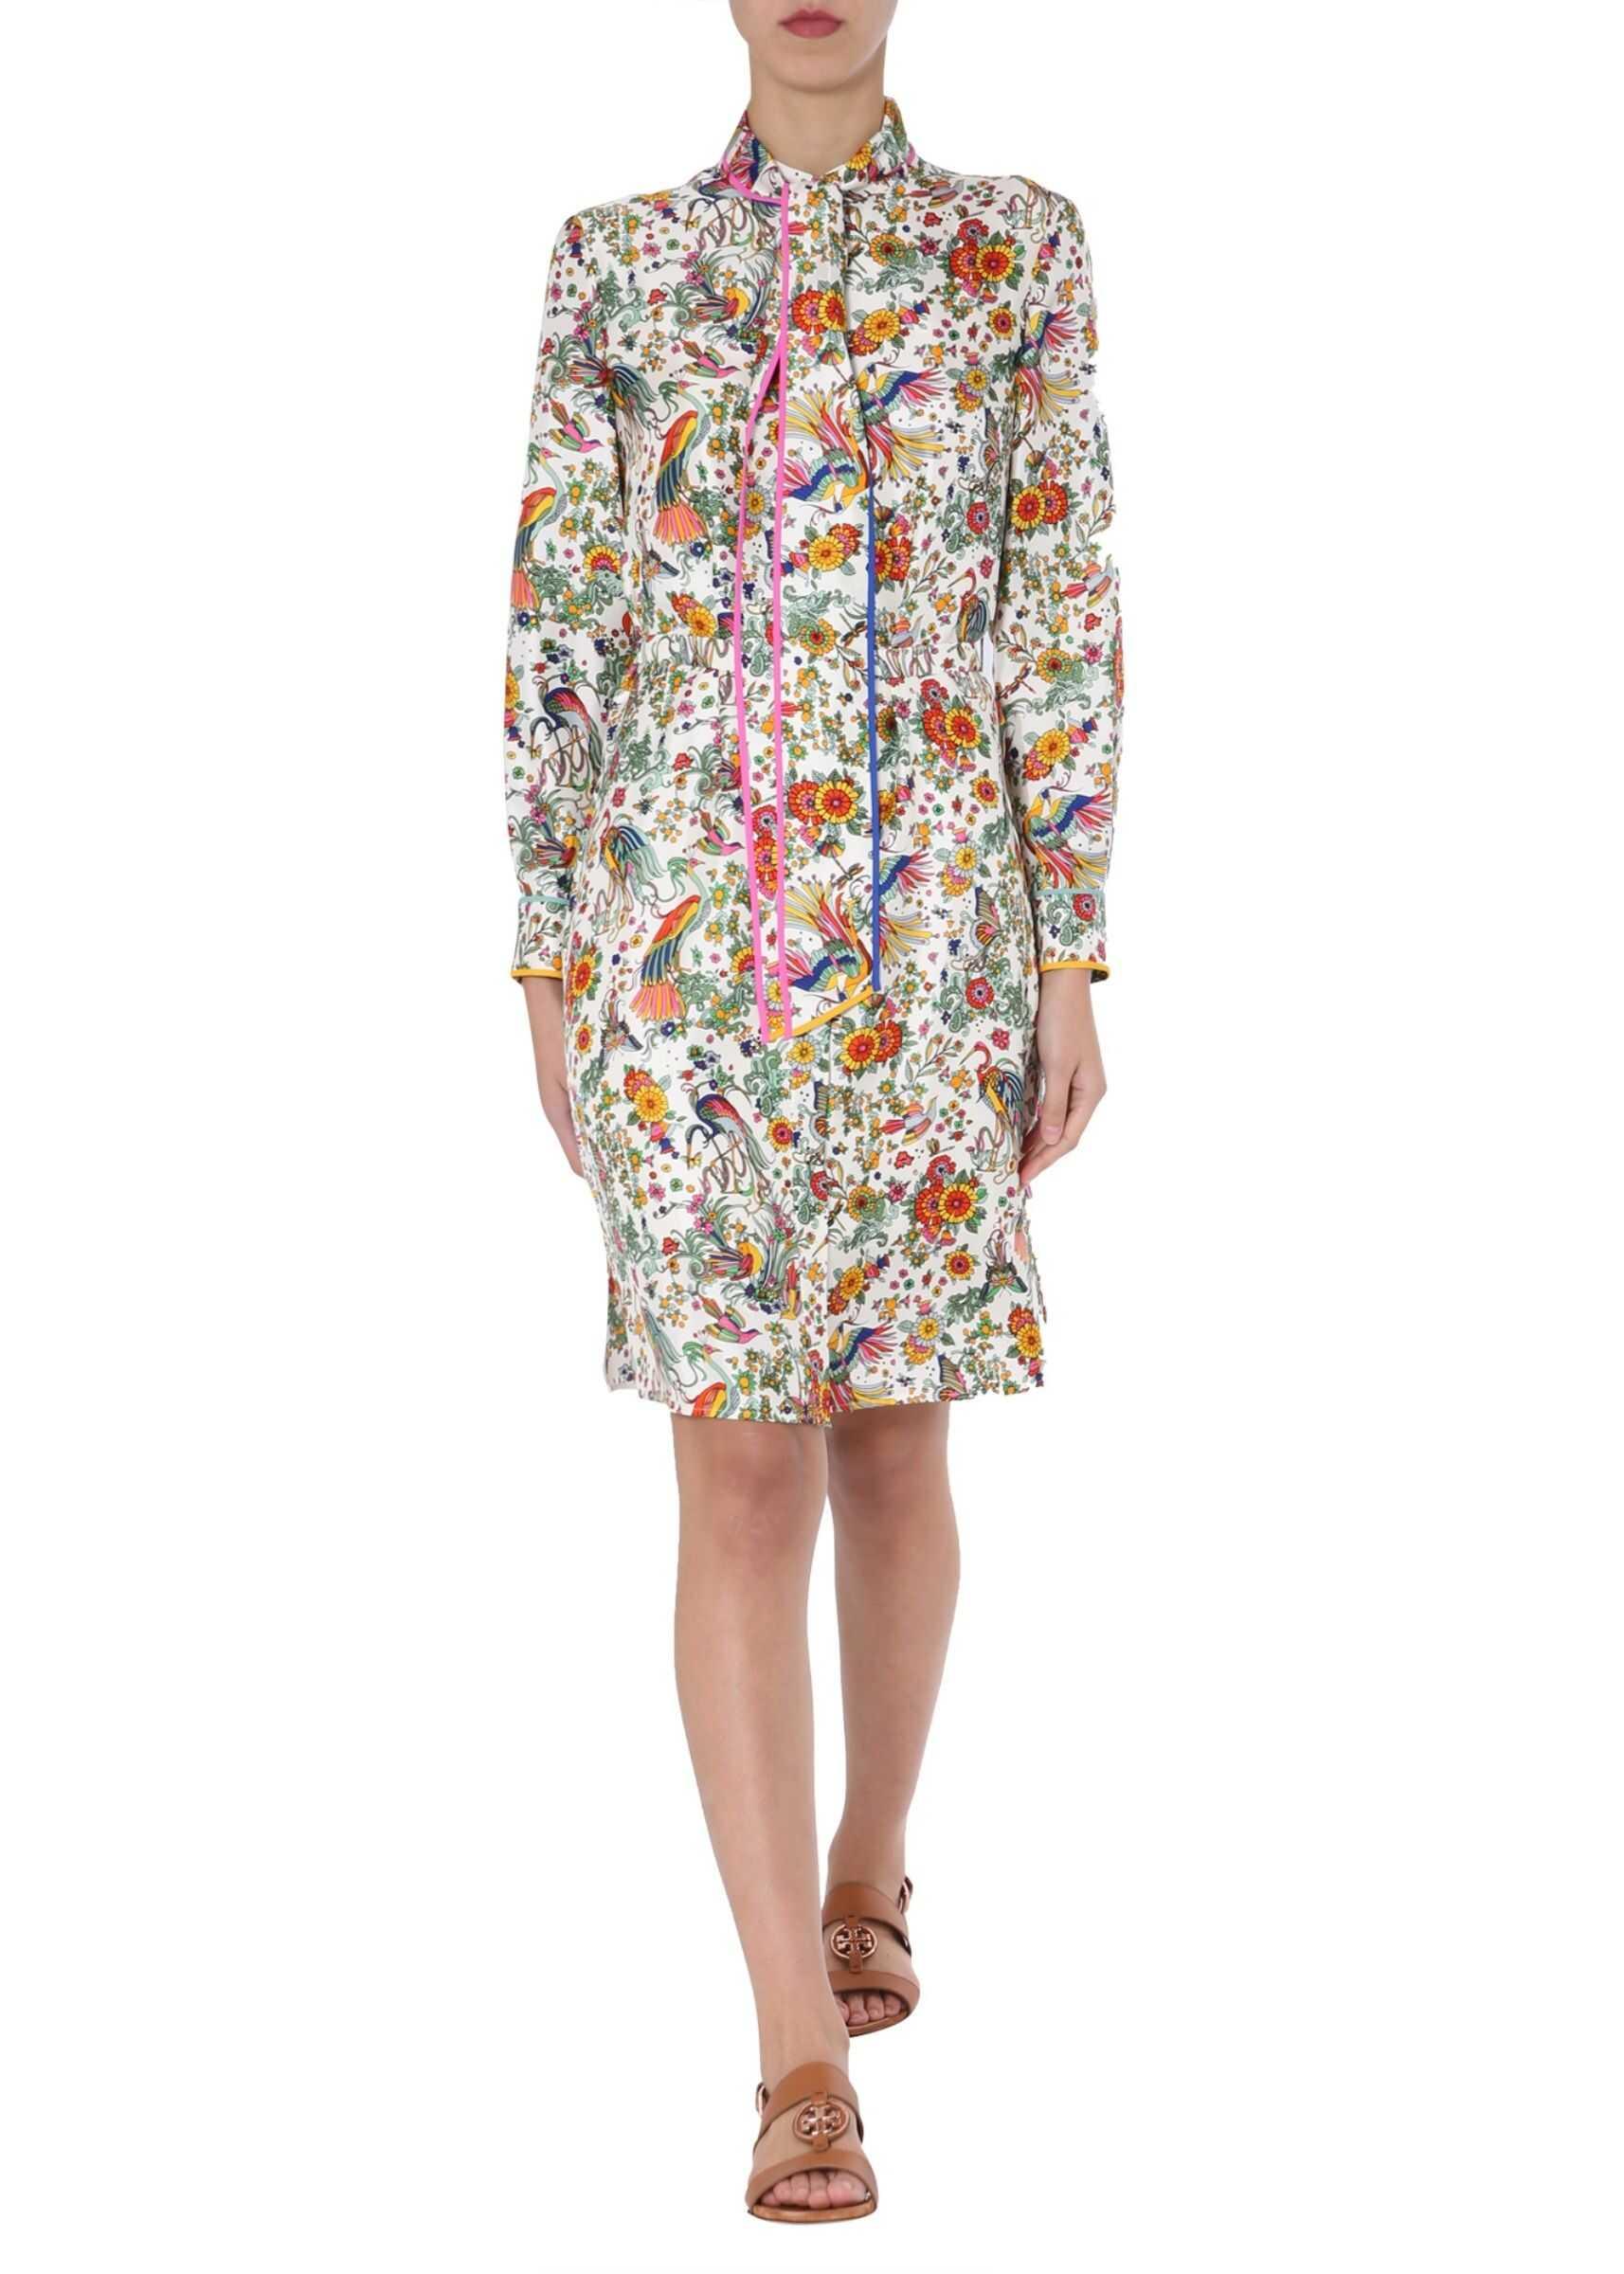 Tory Burch Shirt Dress MULTICOLOUR